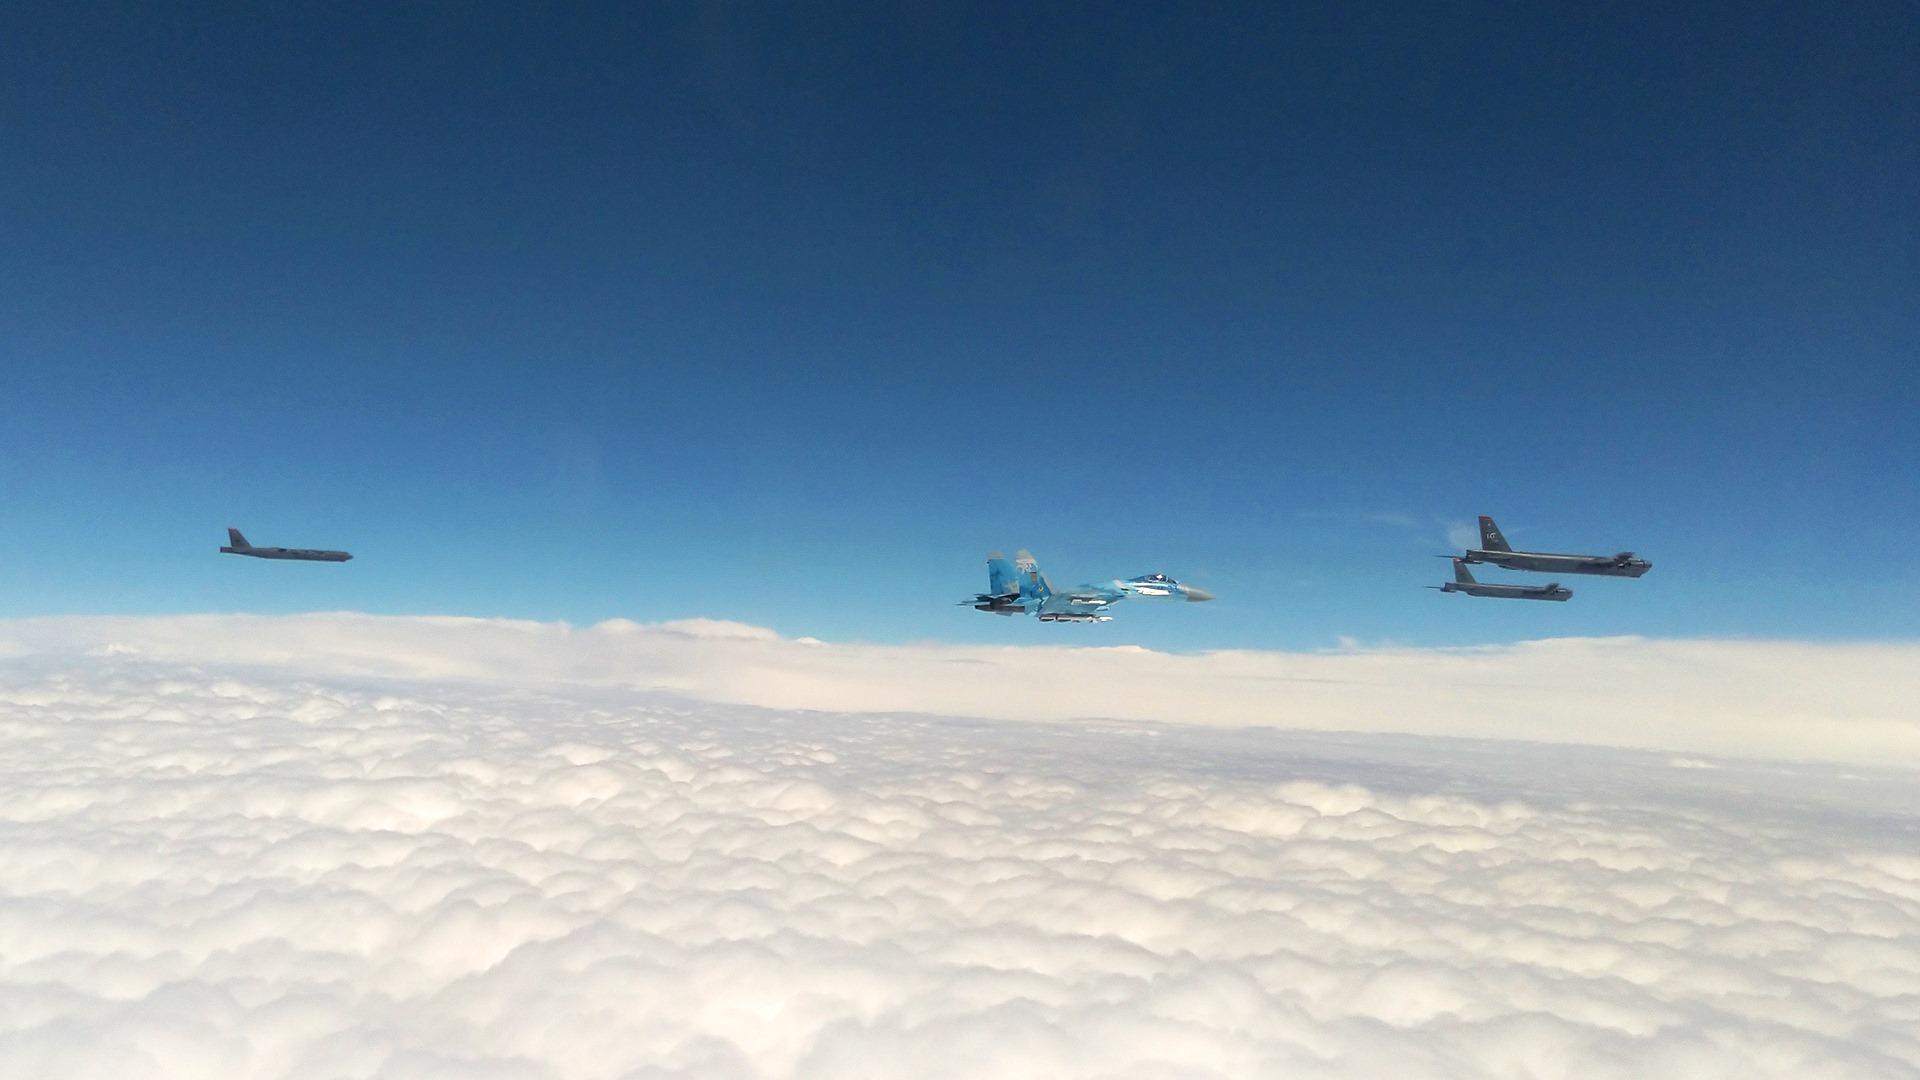 Reduzierung des Appetits Russlands mit US-B-52H-Bombern